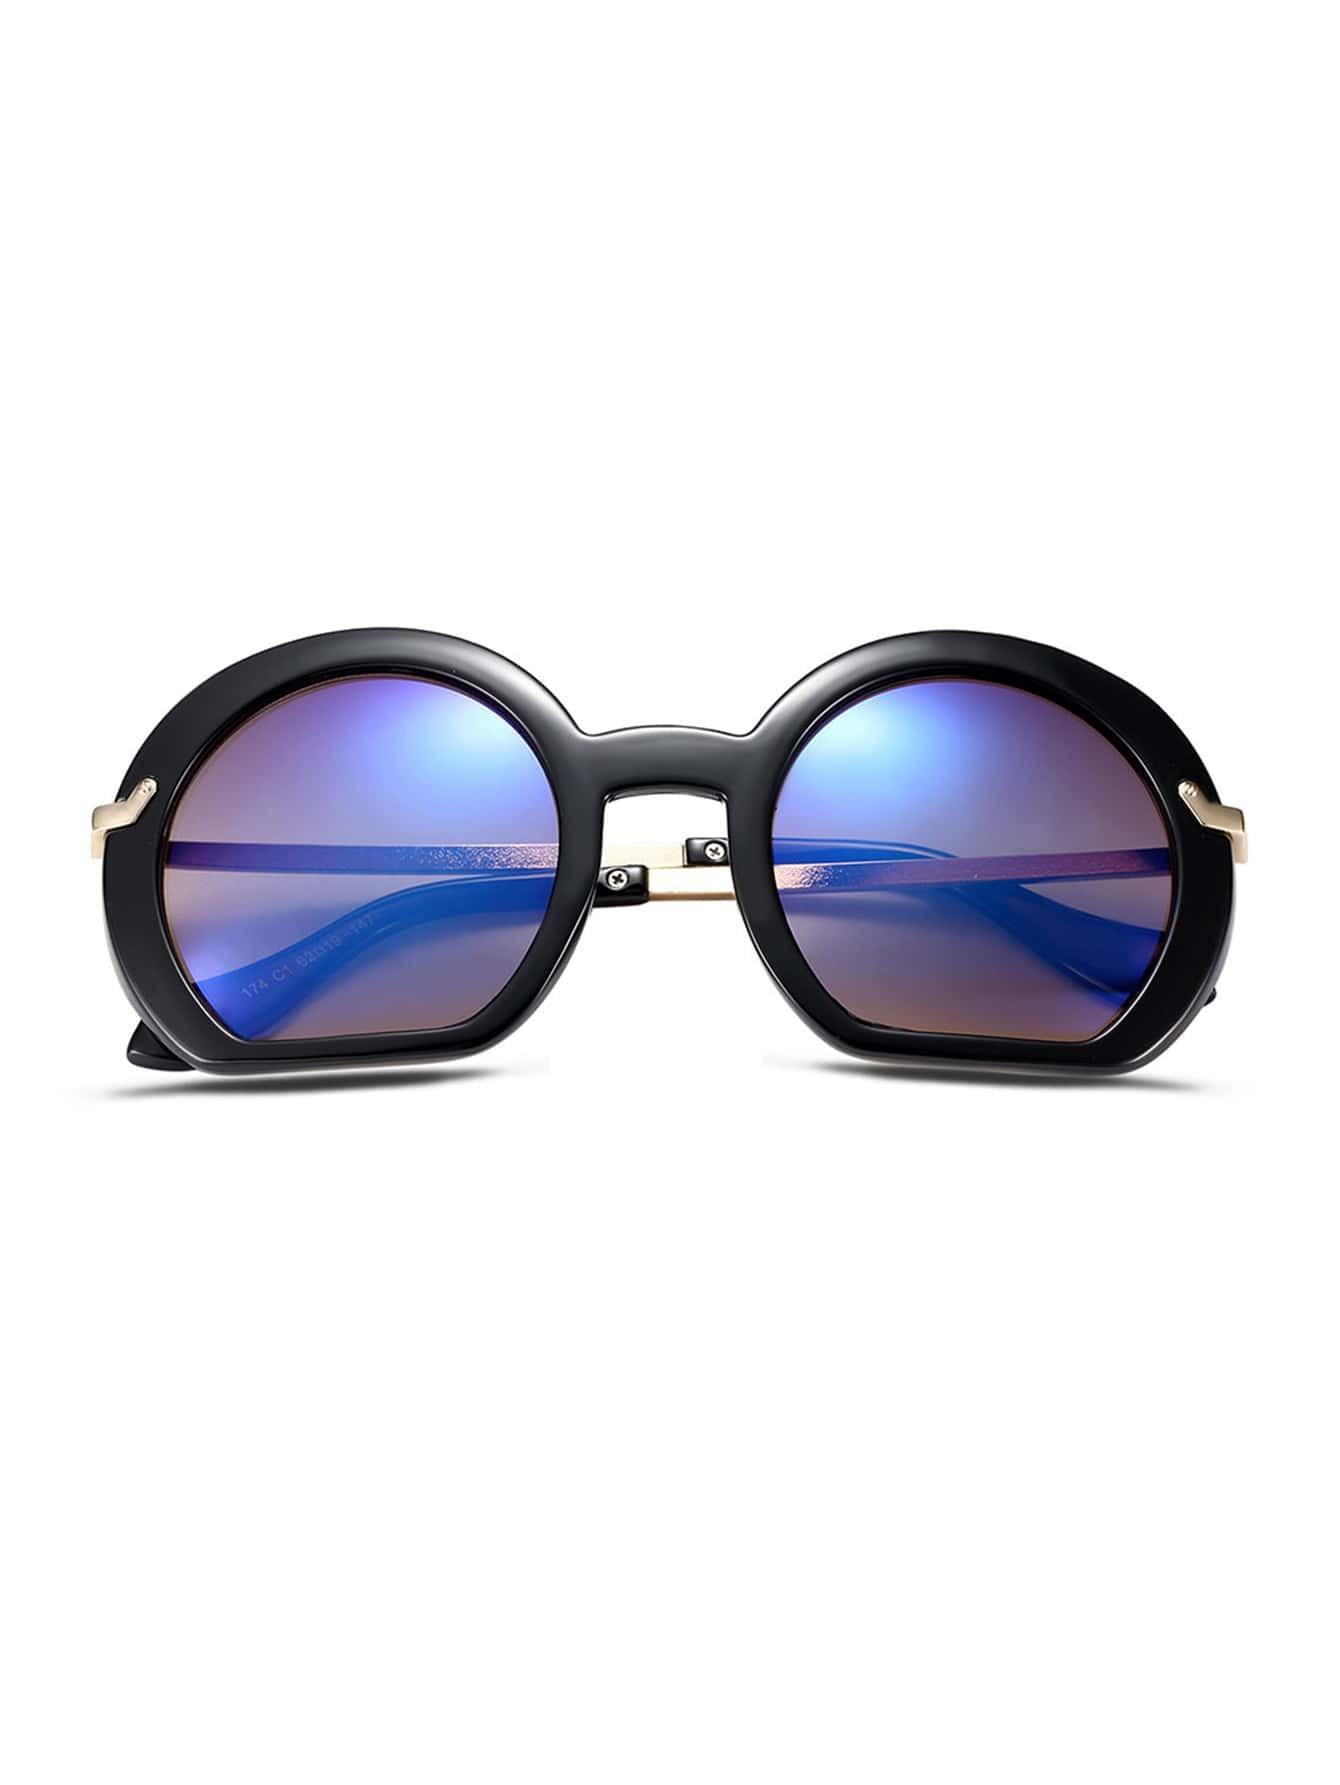 Big Gold Frame Sunglasses : Black Frame Large Lens Gold Arm Sunglasses -SheIn(Sheinside)